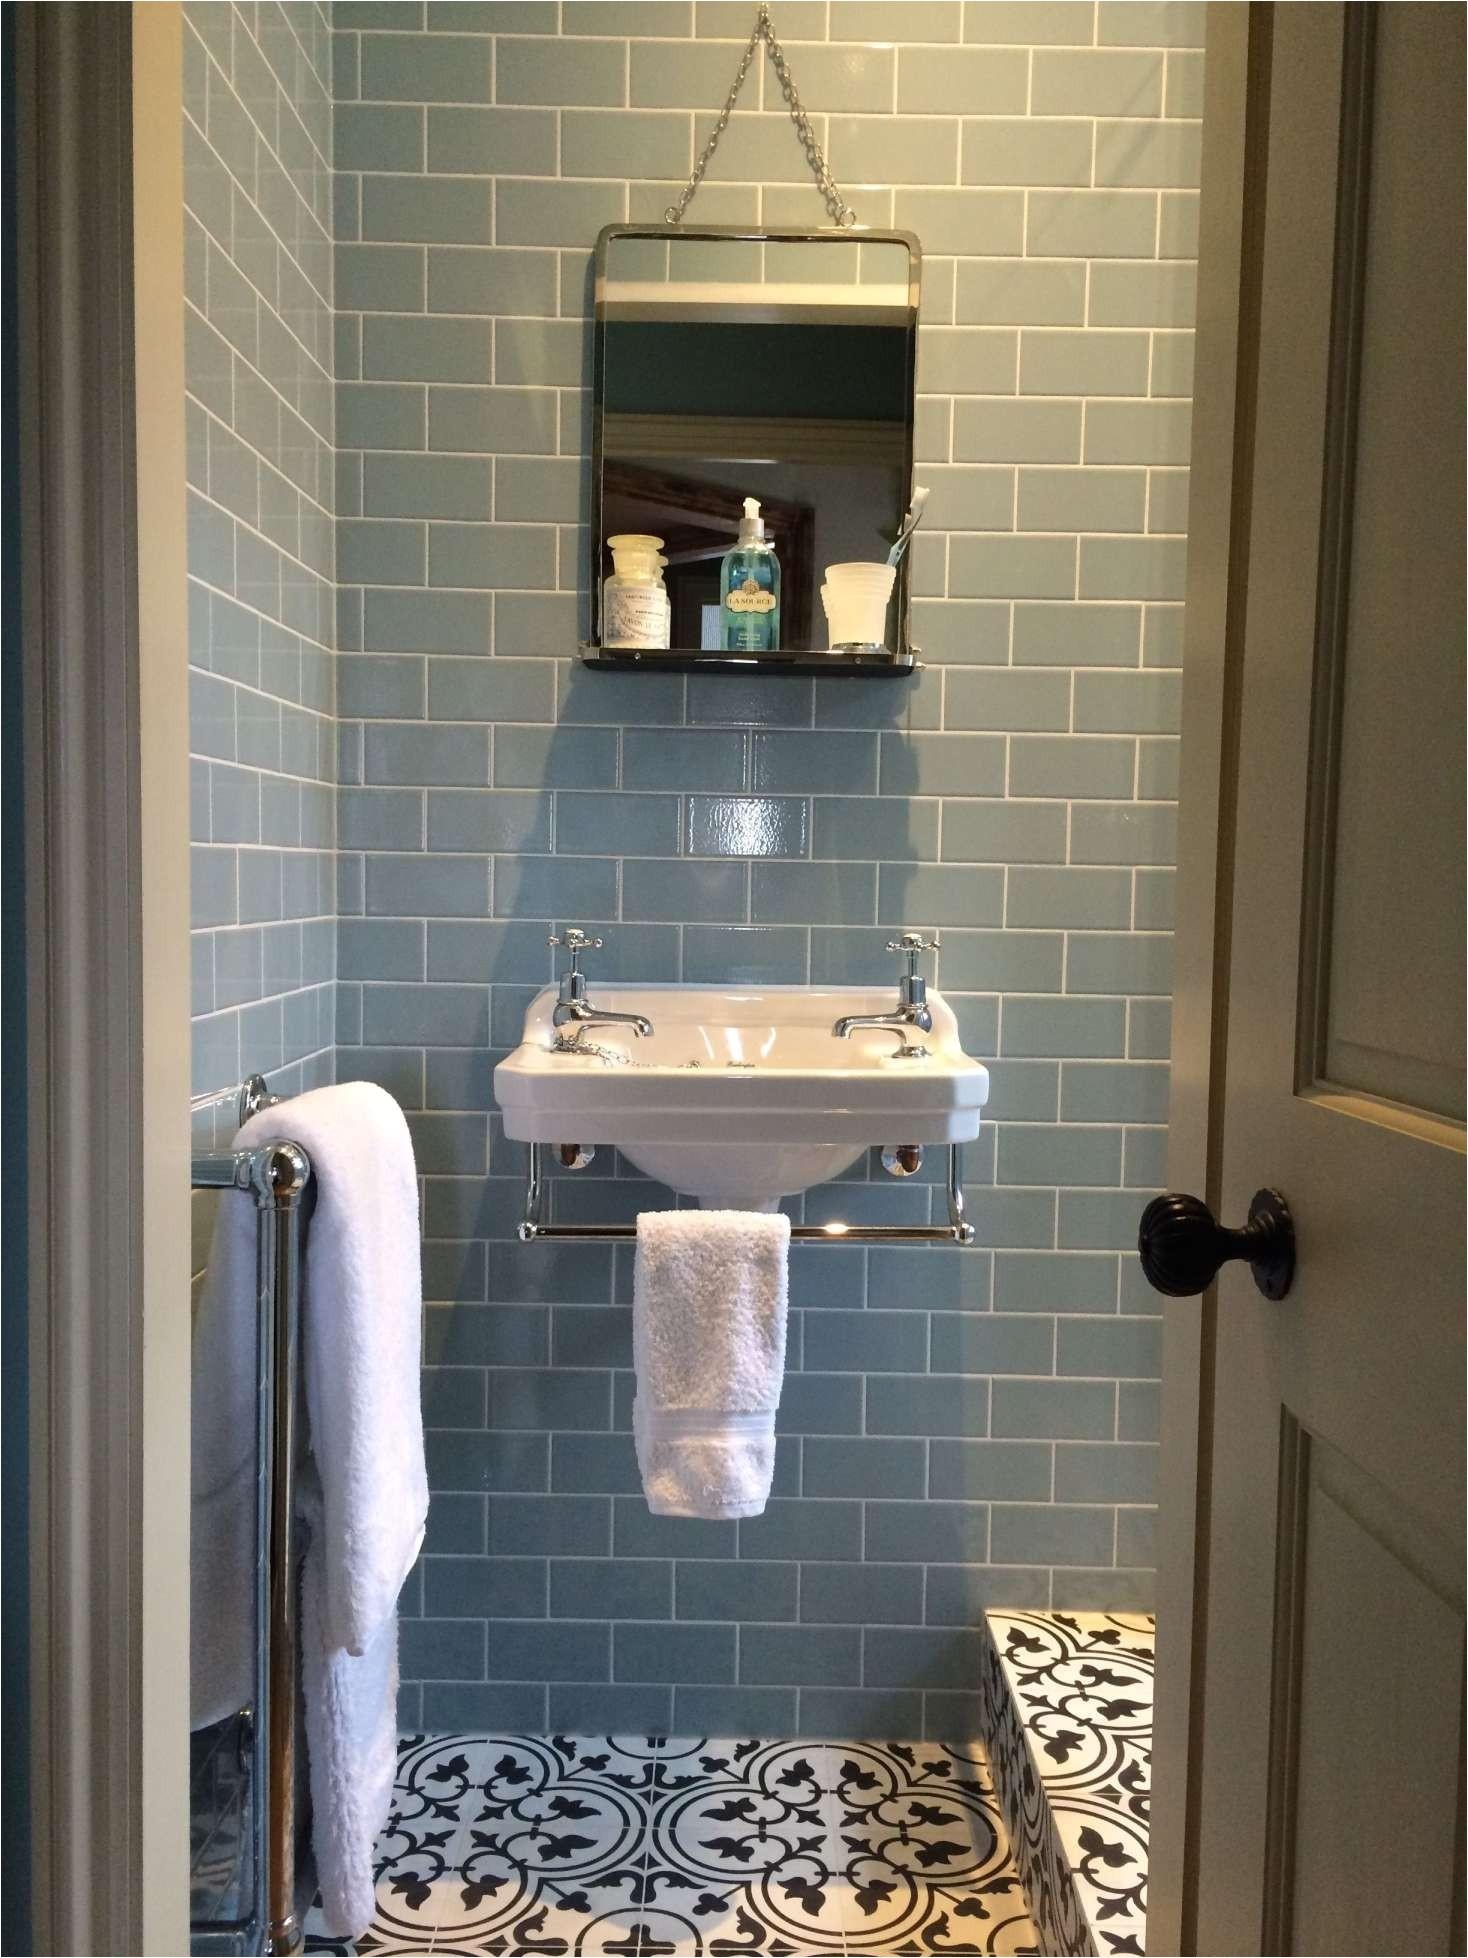 Bathroom Tile Design Ideas Designer Bathroom Tile Best Bathroom Floor Tile Design Ideas New